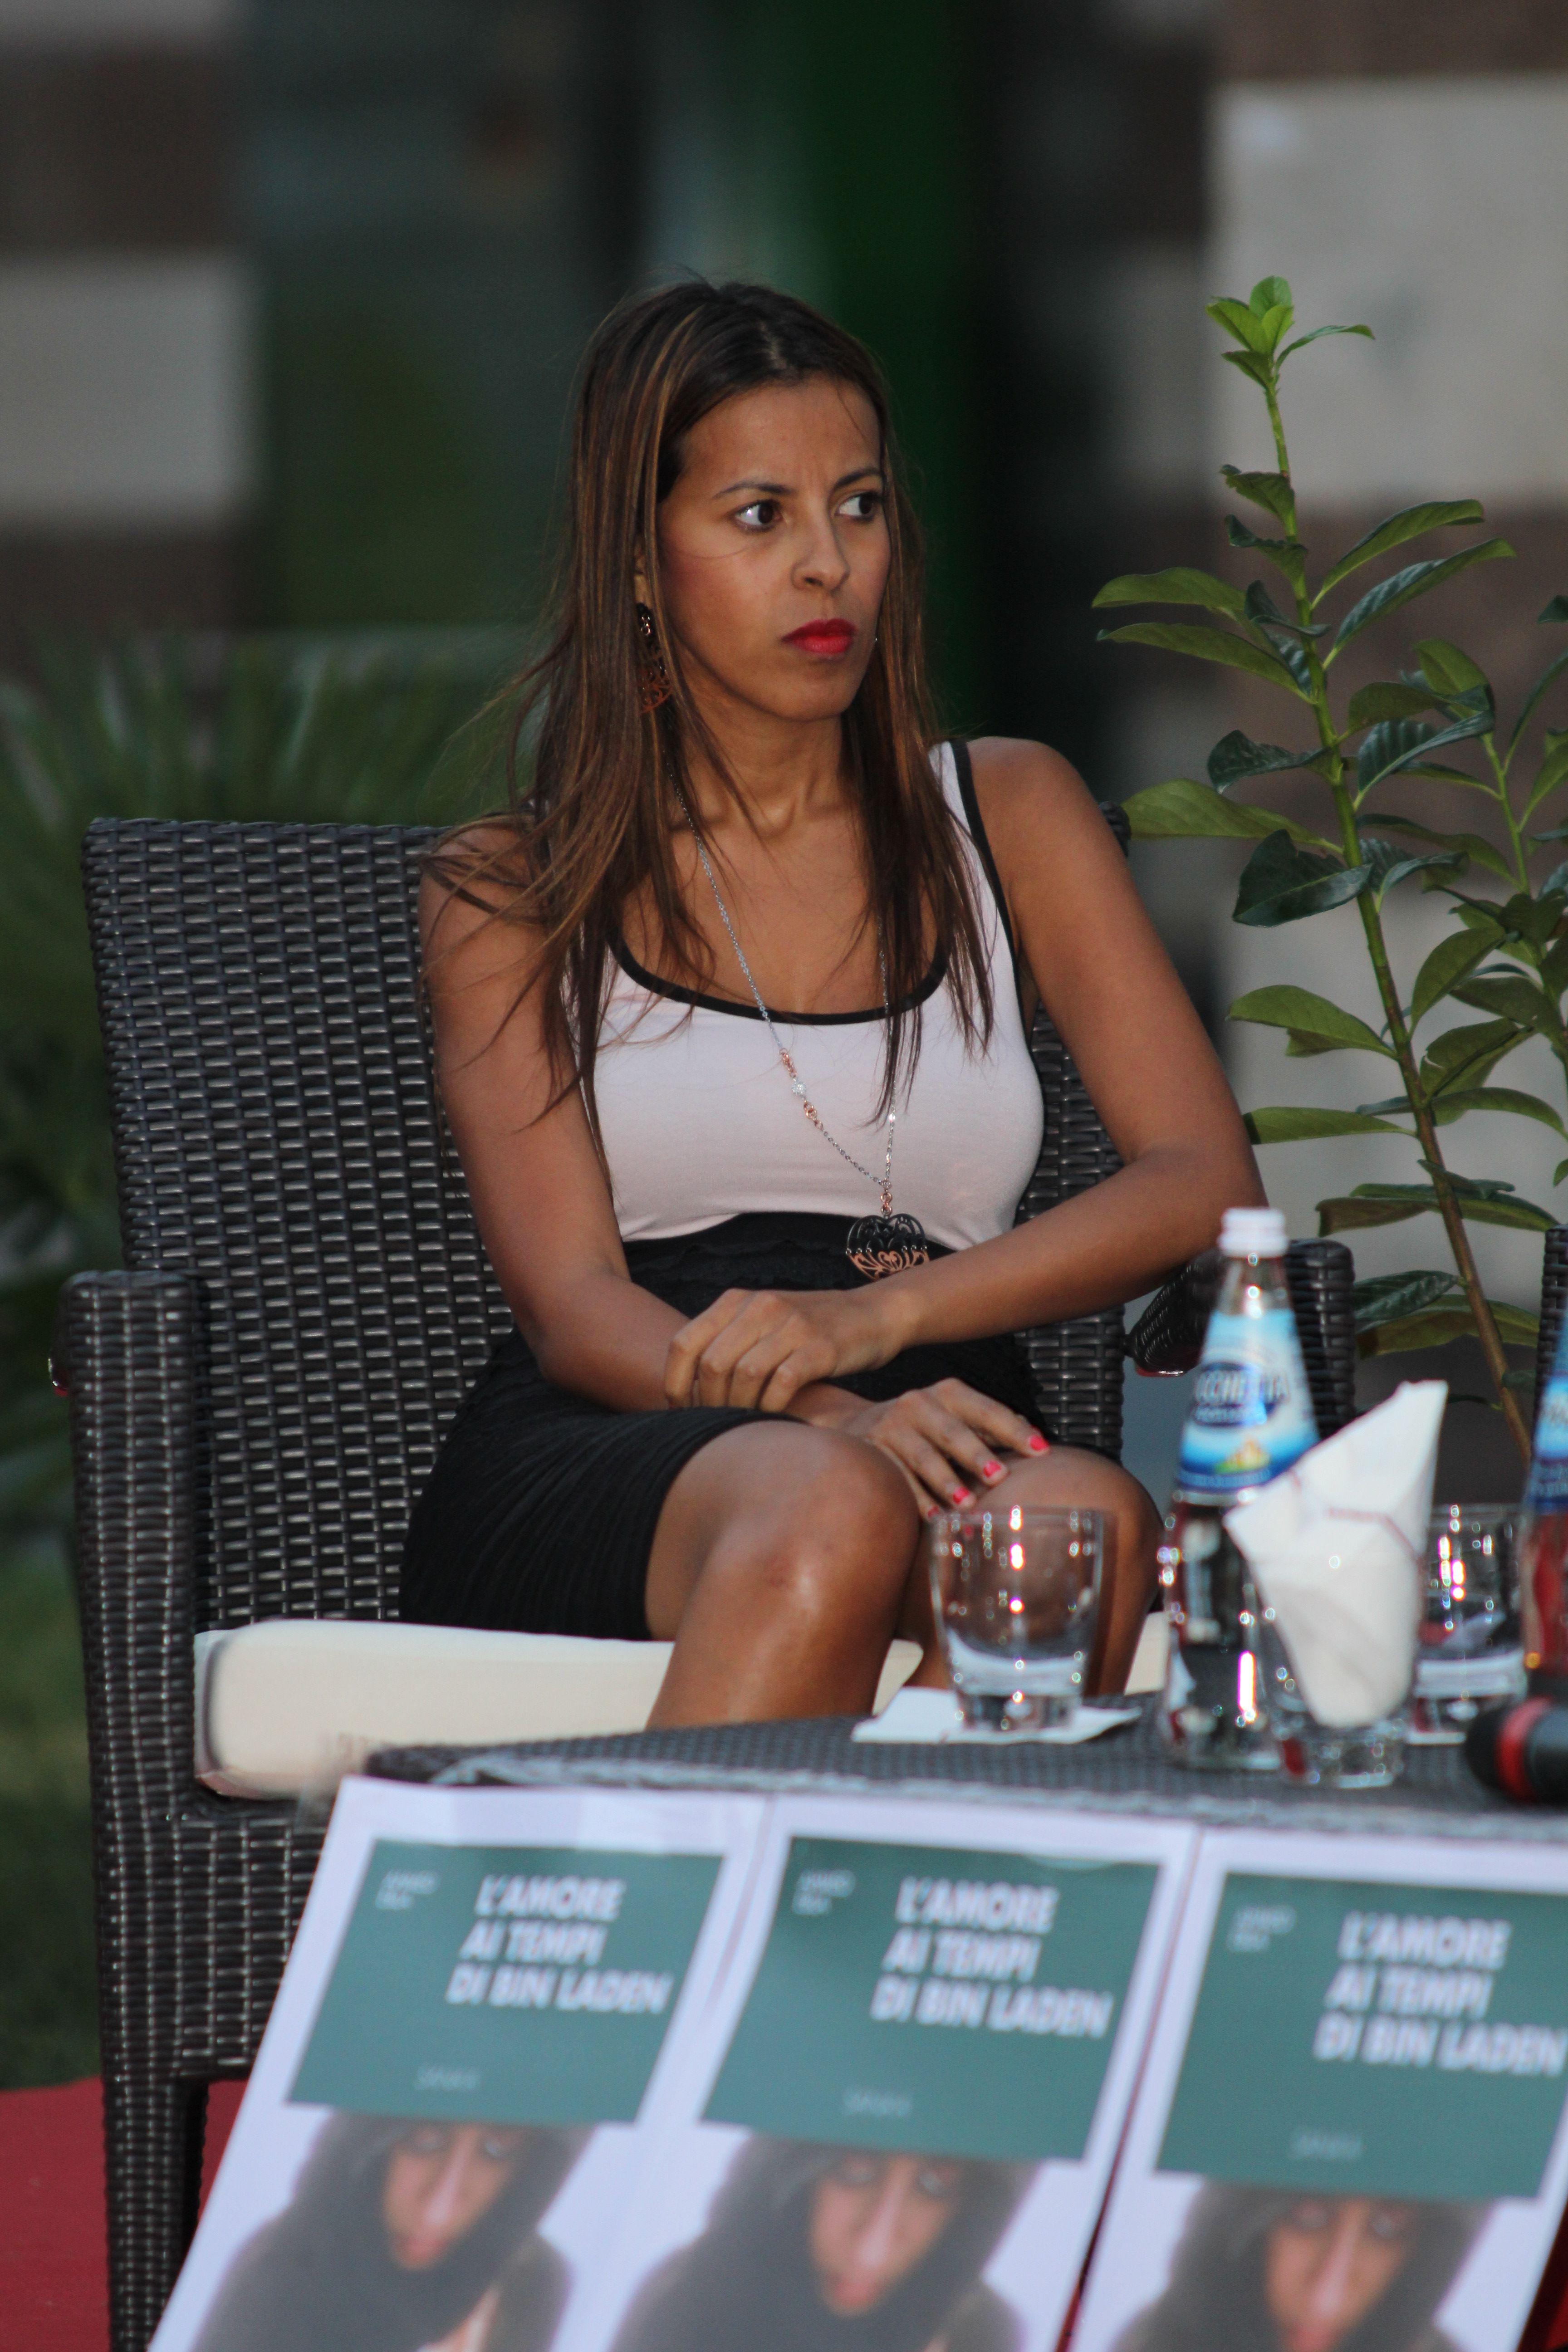 Ebla Ahmed exibition in Montecatini Terme for Miss Italia